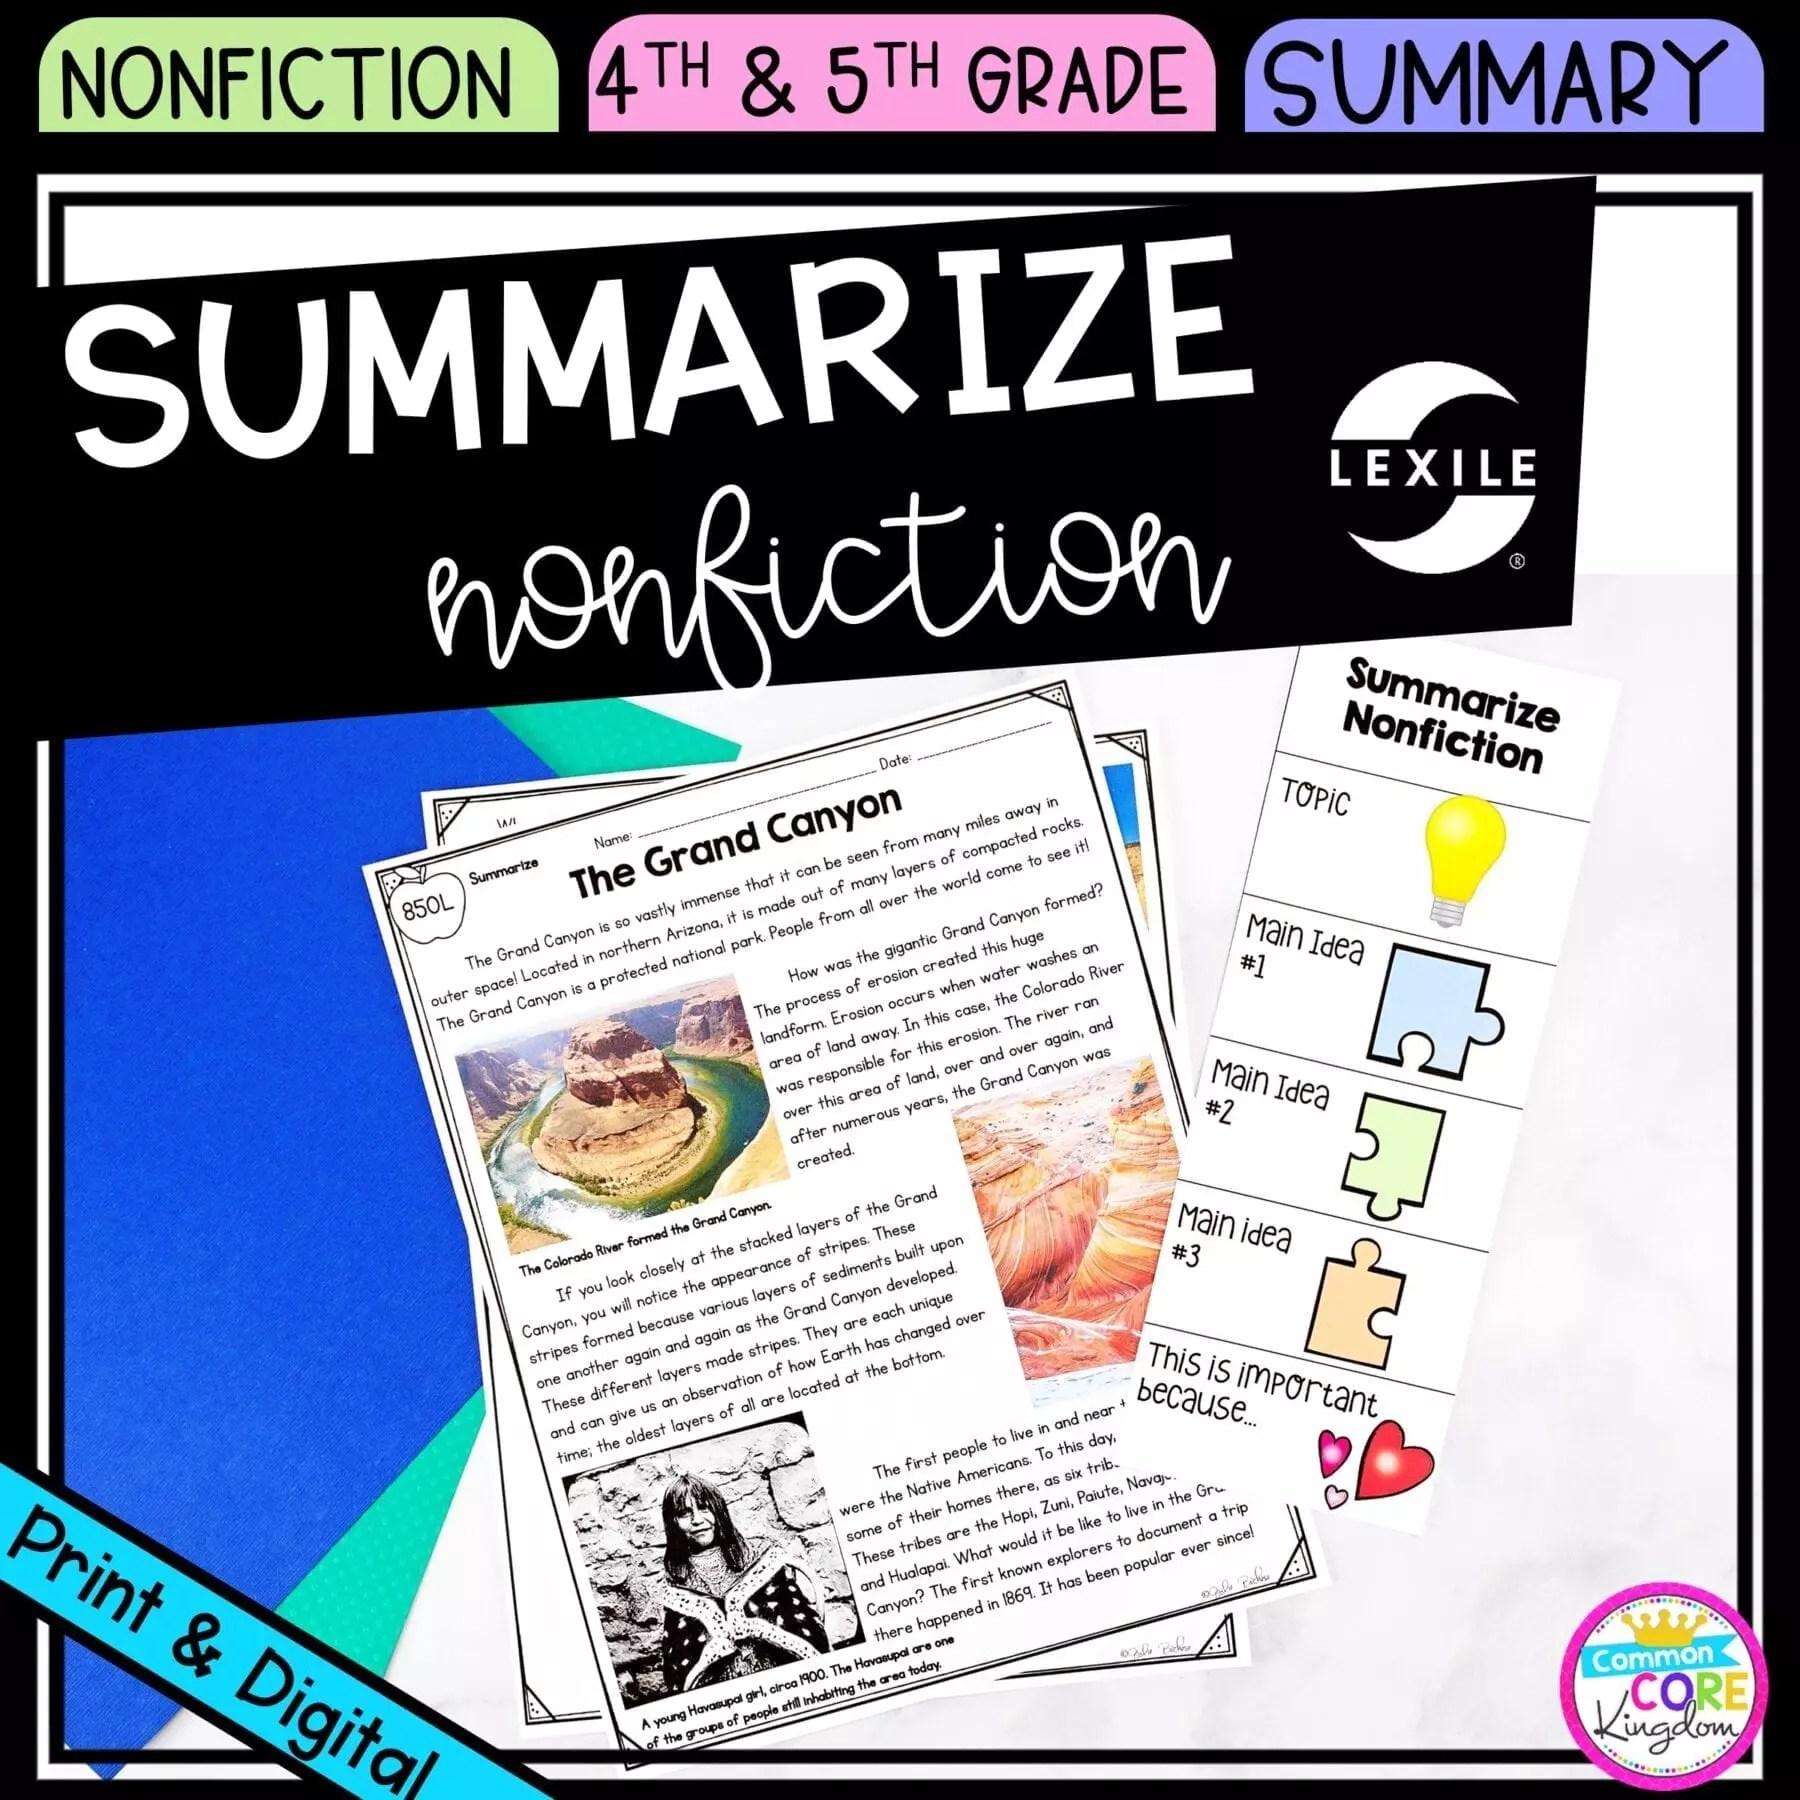 hight resolution of Summarize Nonfiction 4th \u0026 5th Grade - Google Distance Learning   Common  Core Kingdom